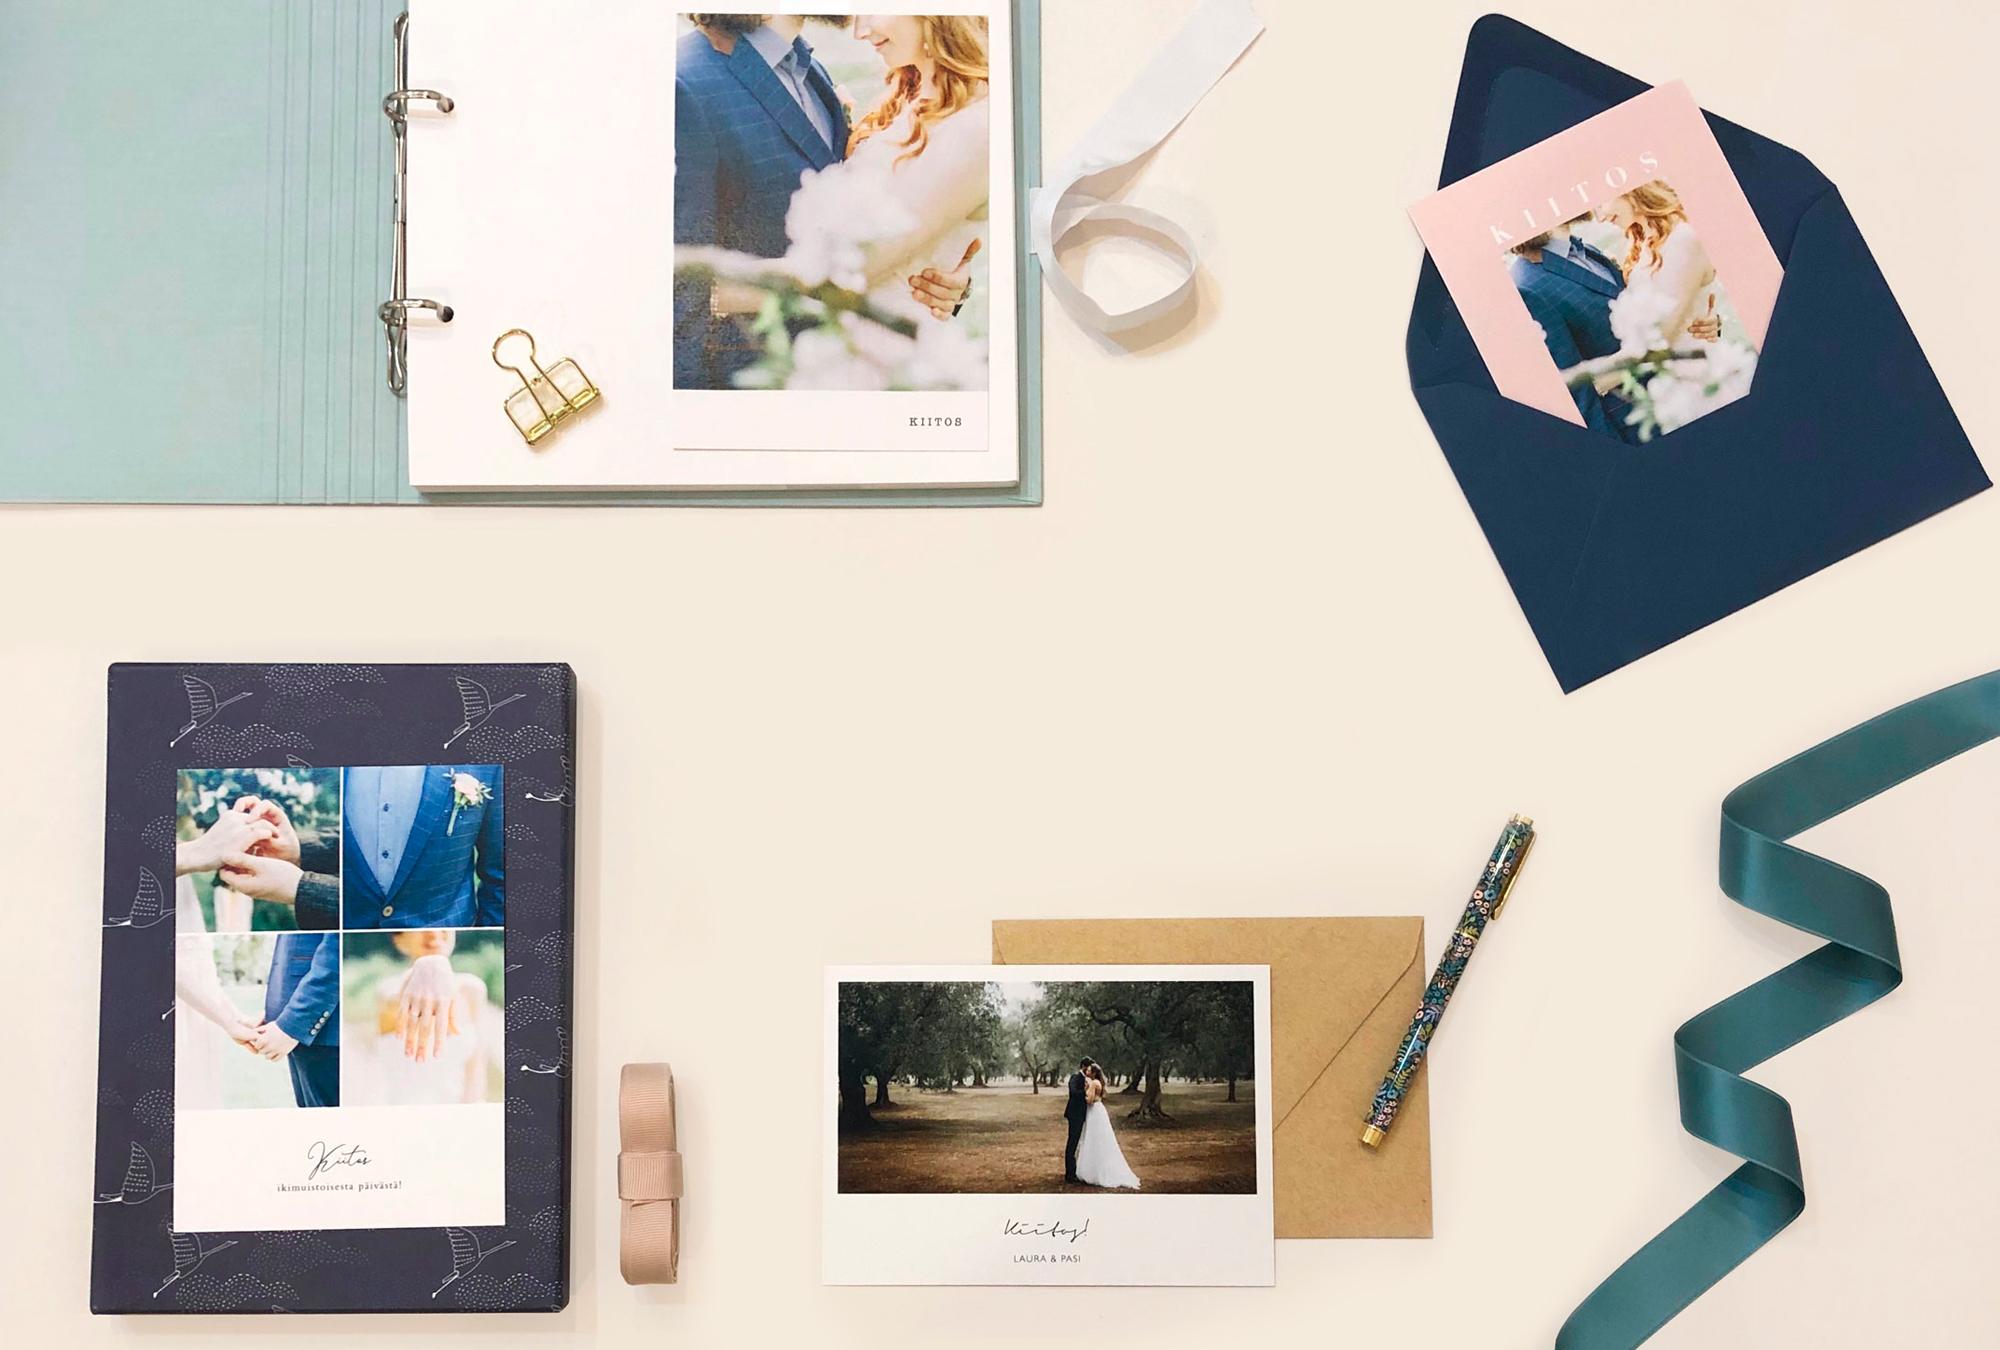 Papershop painostudio Kiitoskortit